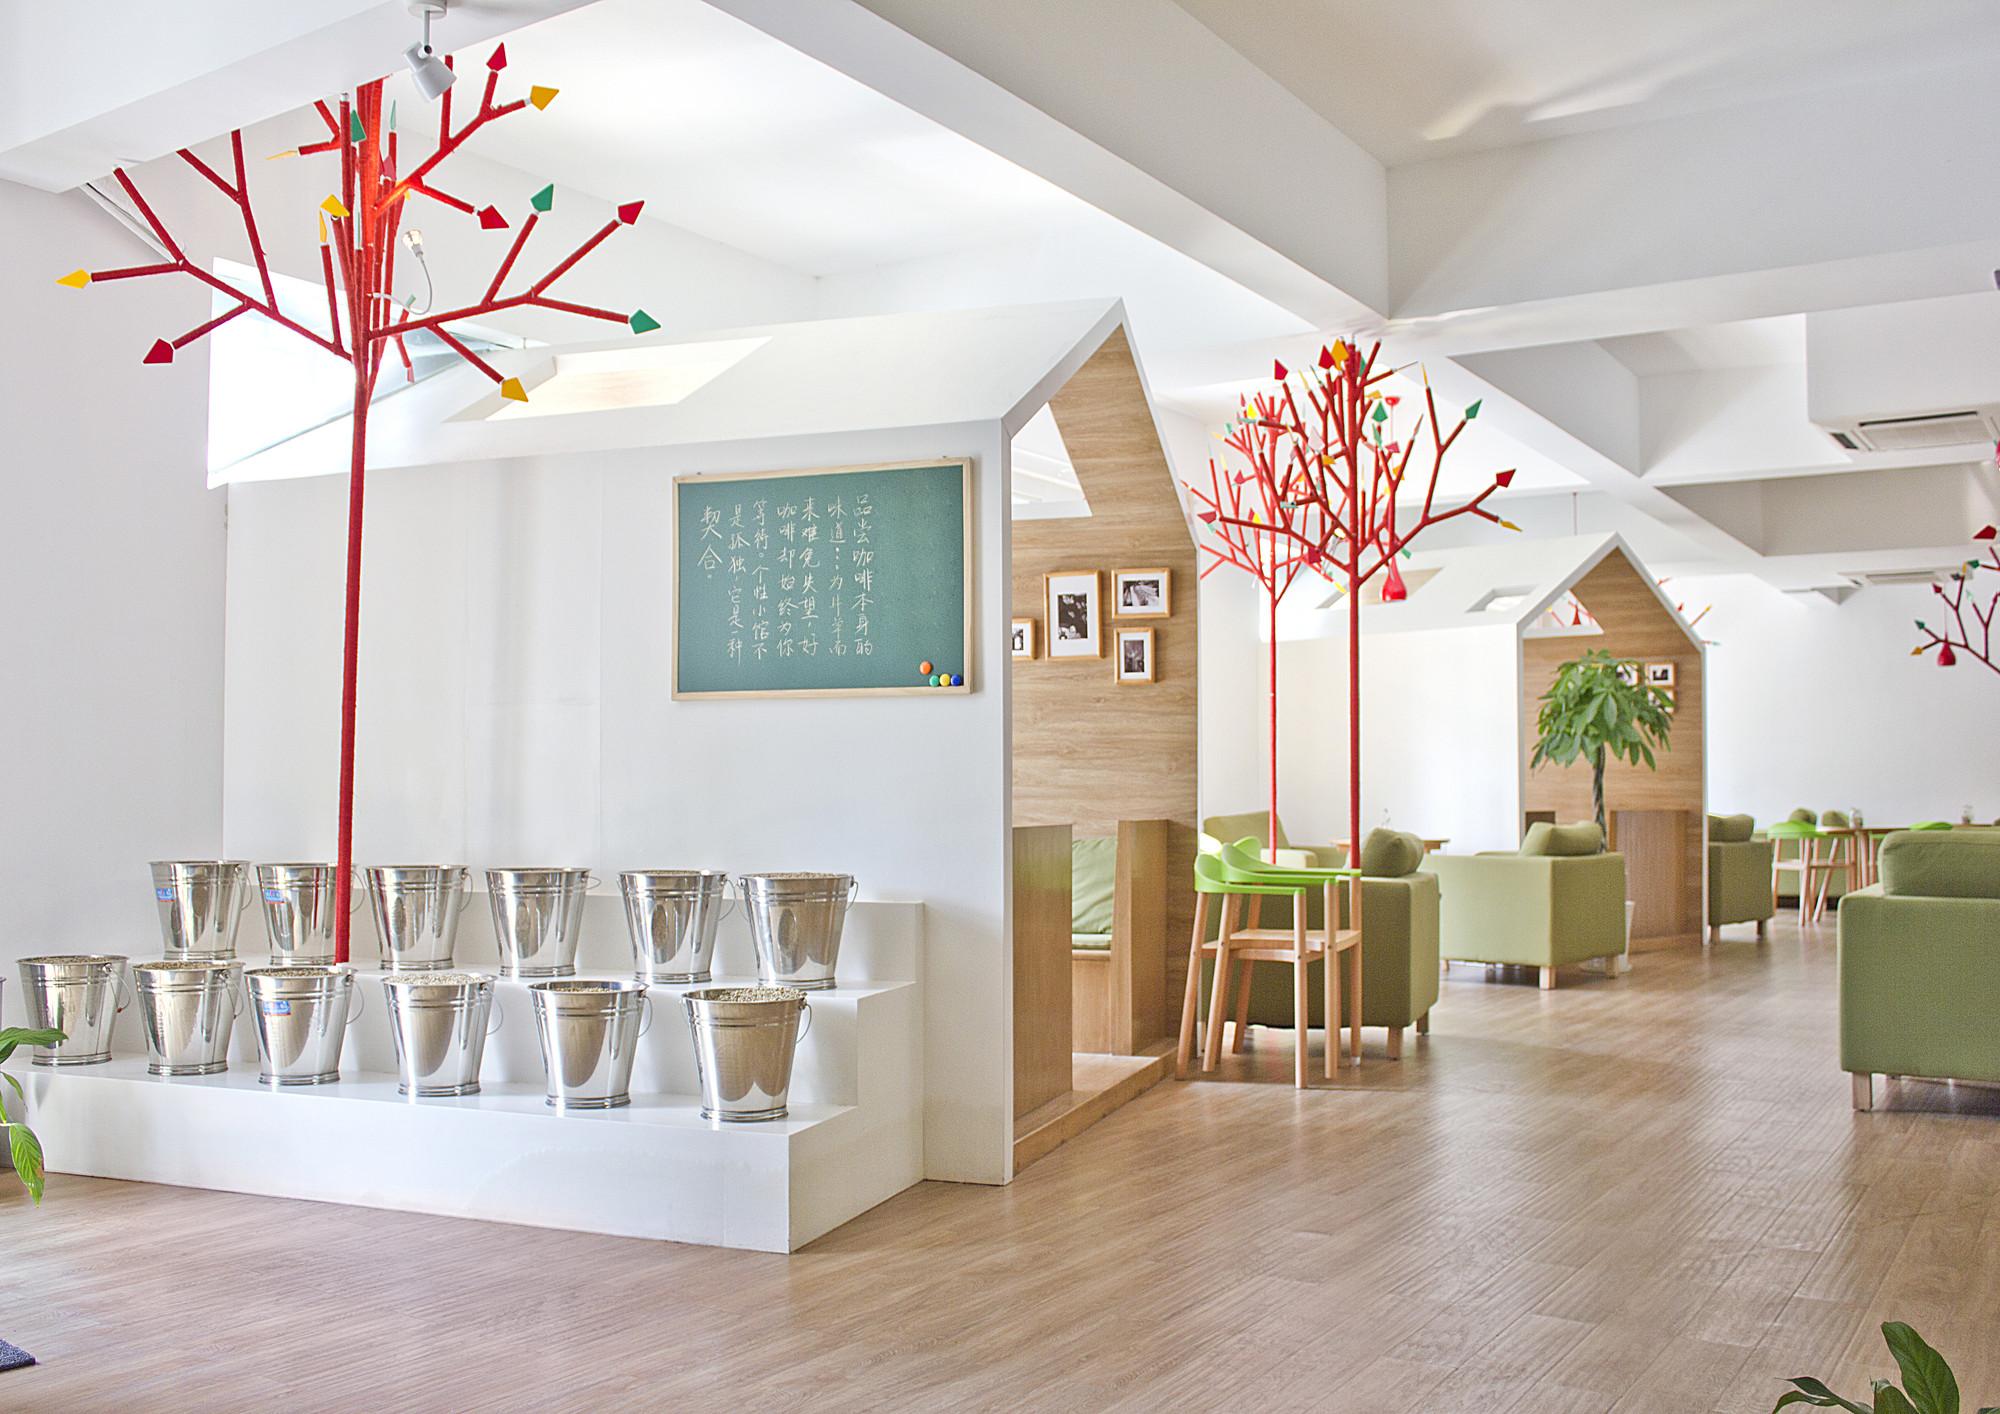 Kale Café / YAMO Design, Courtesy of YAMO Design